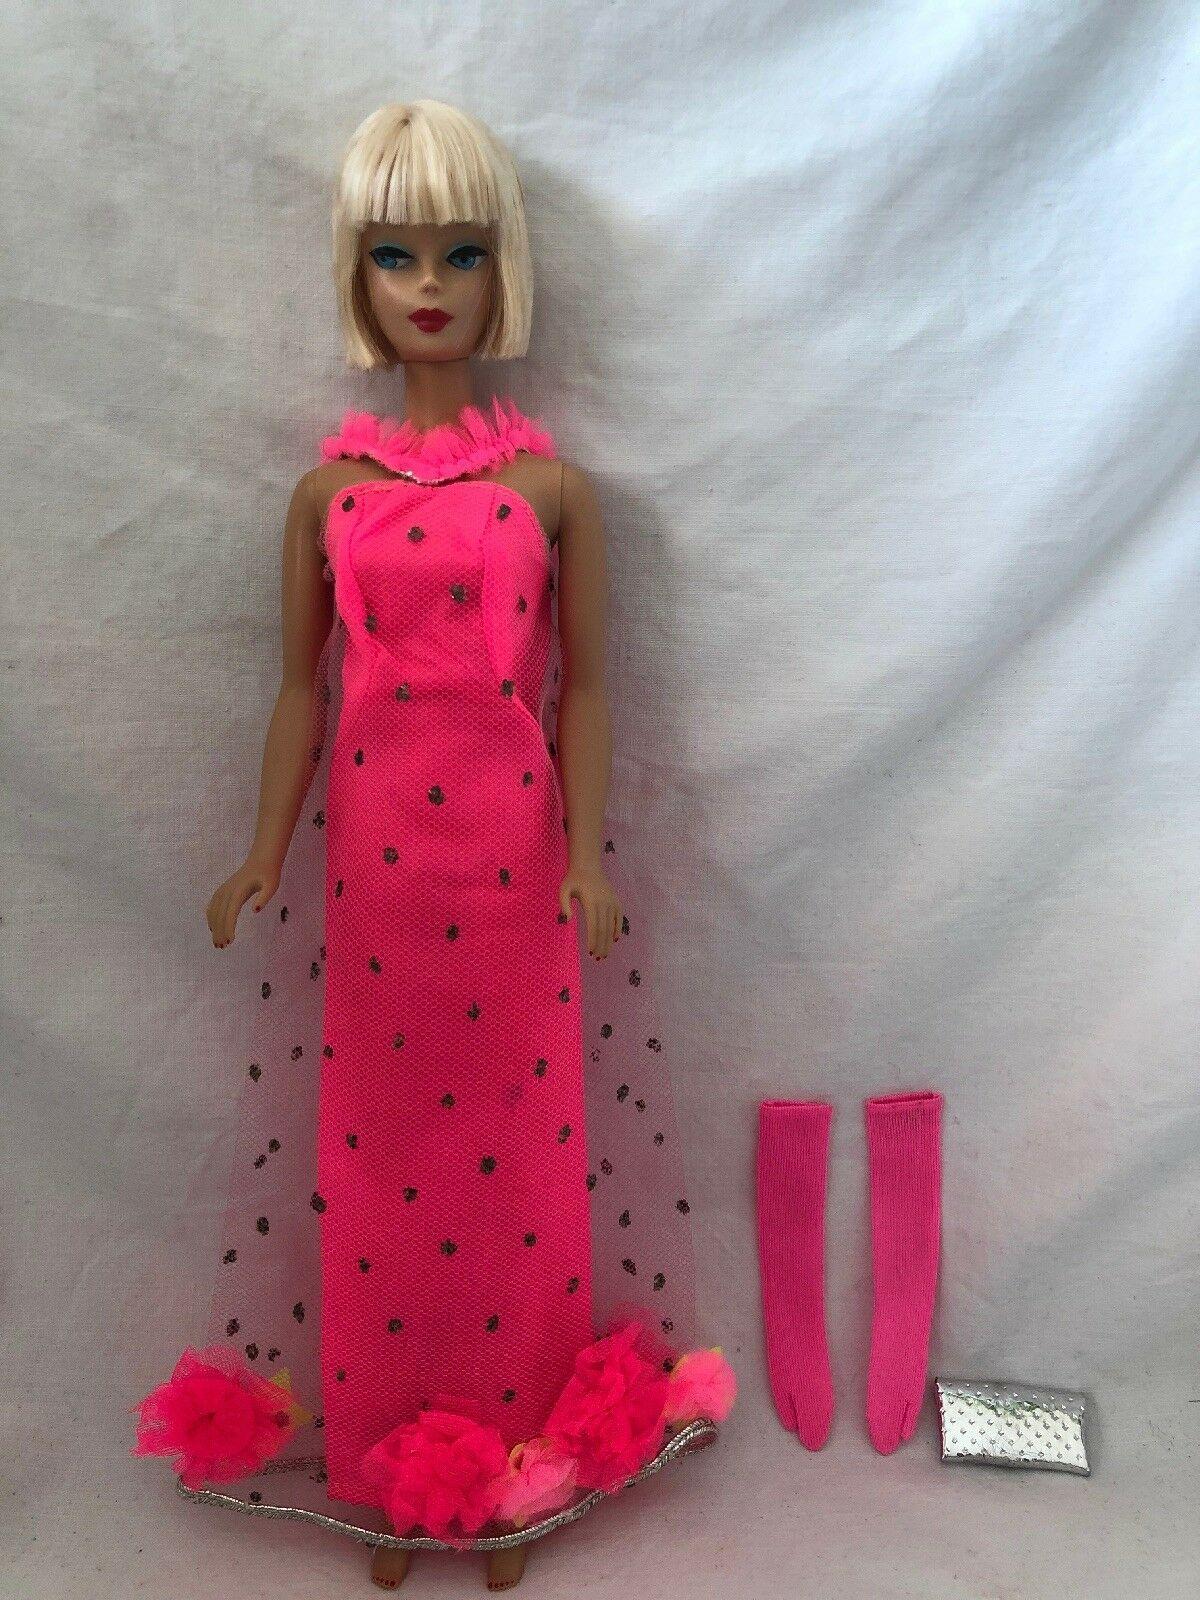 Rare Vintage Barbie Doll Outfit 1844 Extravaganza Hot Pink Gown Gloves Purse Ebay Vintage Barbie Clothes Vintage Barbie Vintage Barbie Dolls